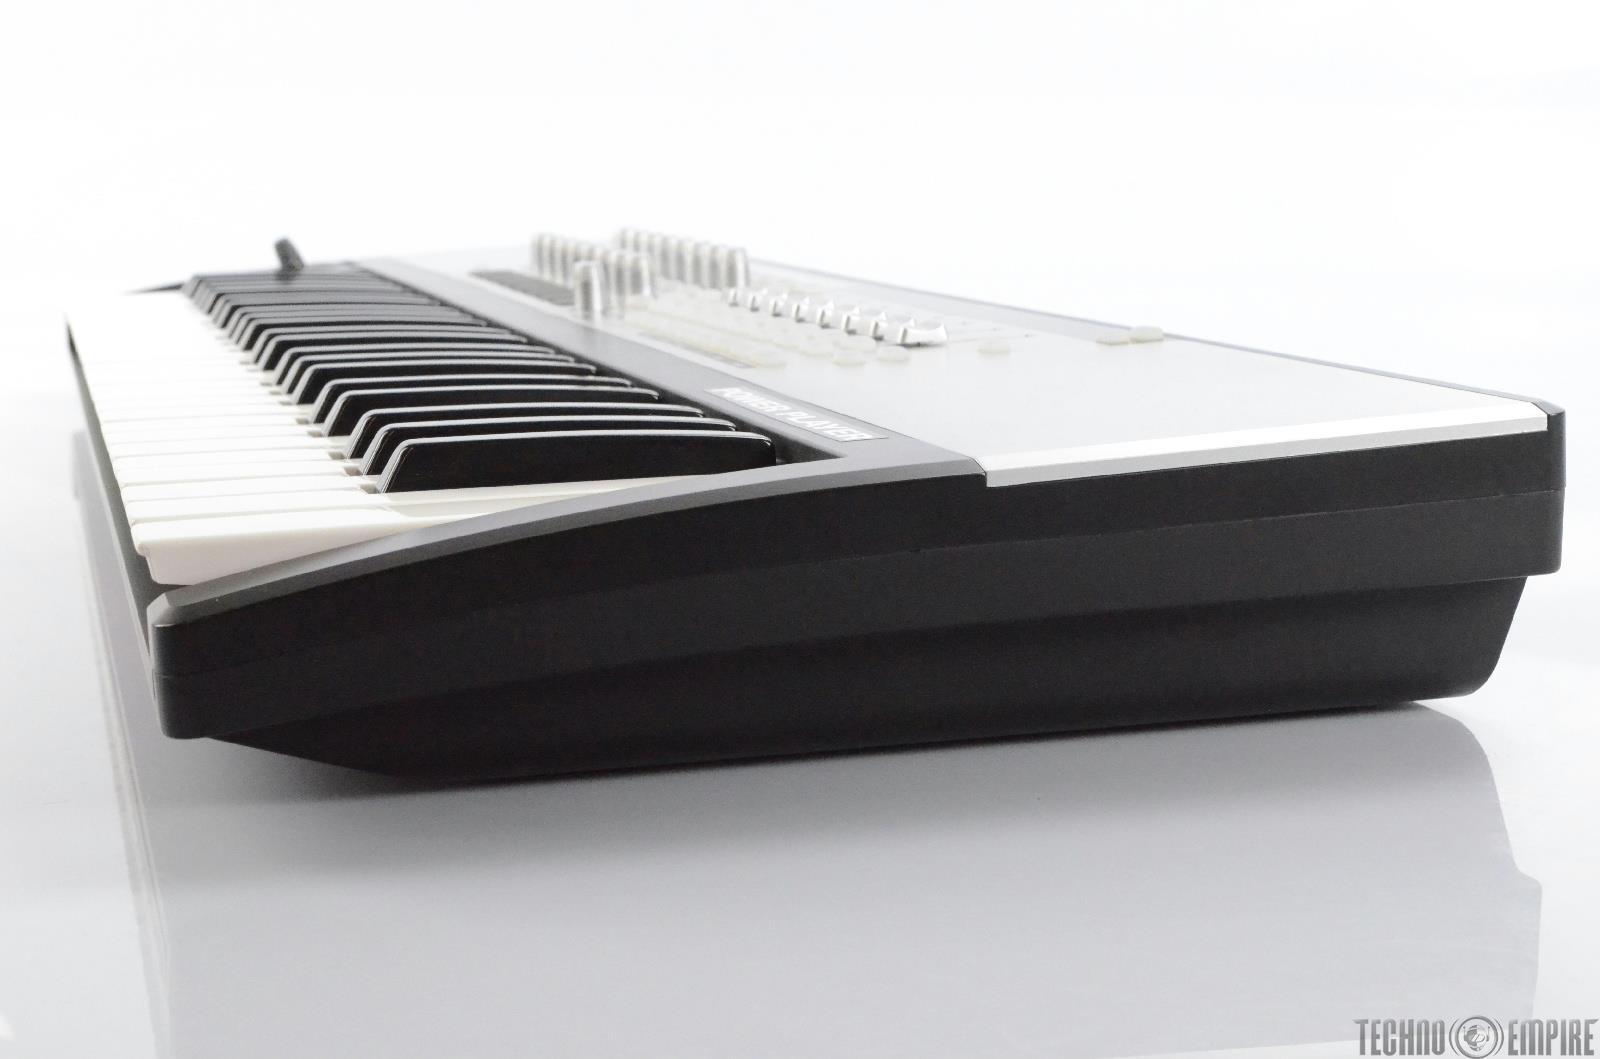 novation 49sl mkii 49 key usb midi semi weighted controller keyboard 30314 ebay. Black Bedroom Furniture Sets. Home Design Ideas